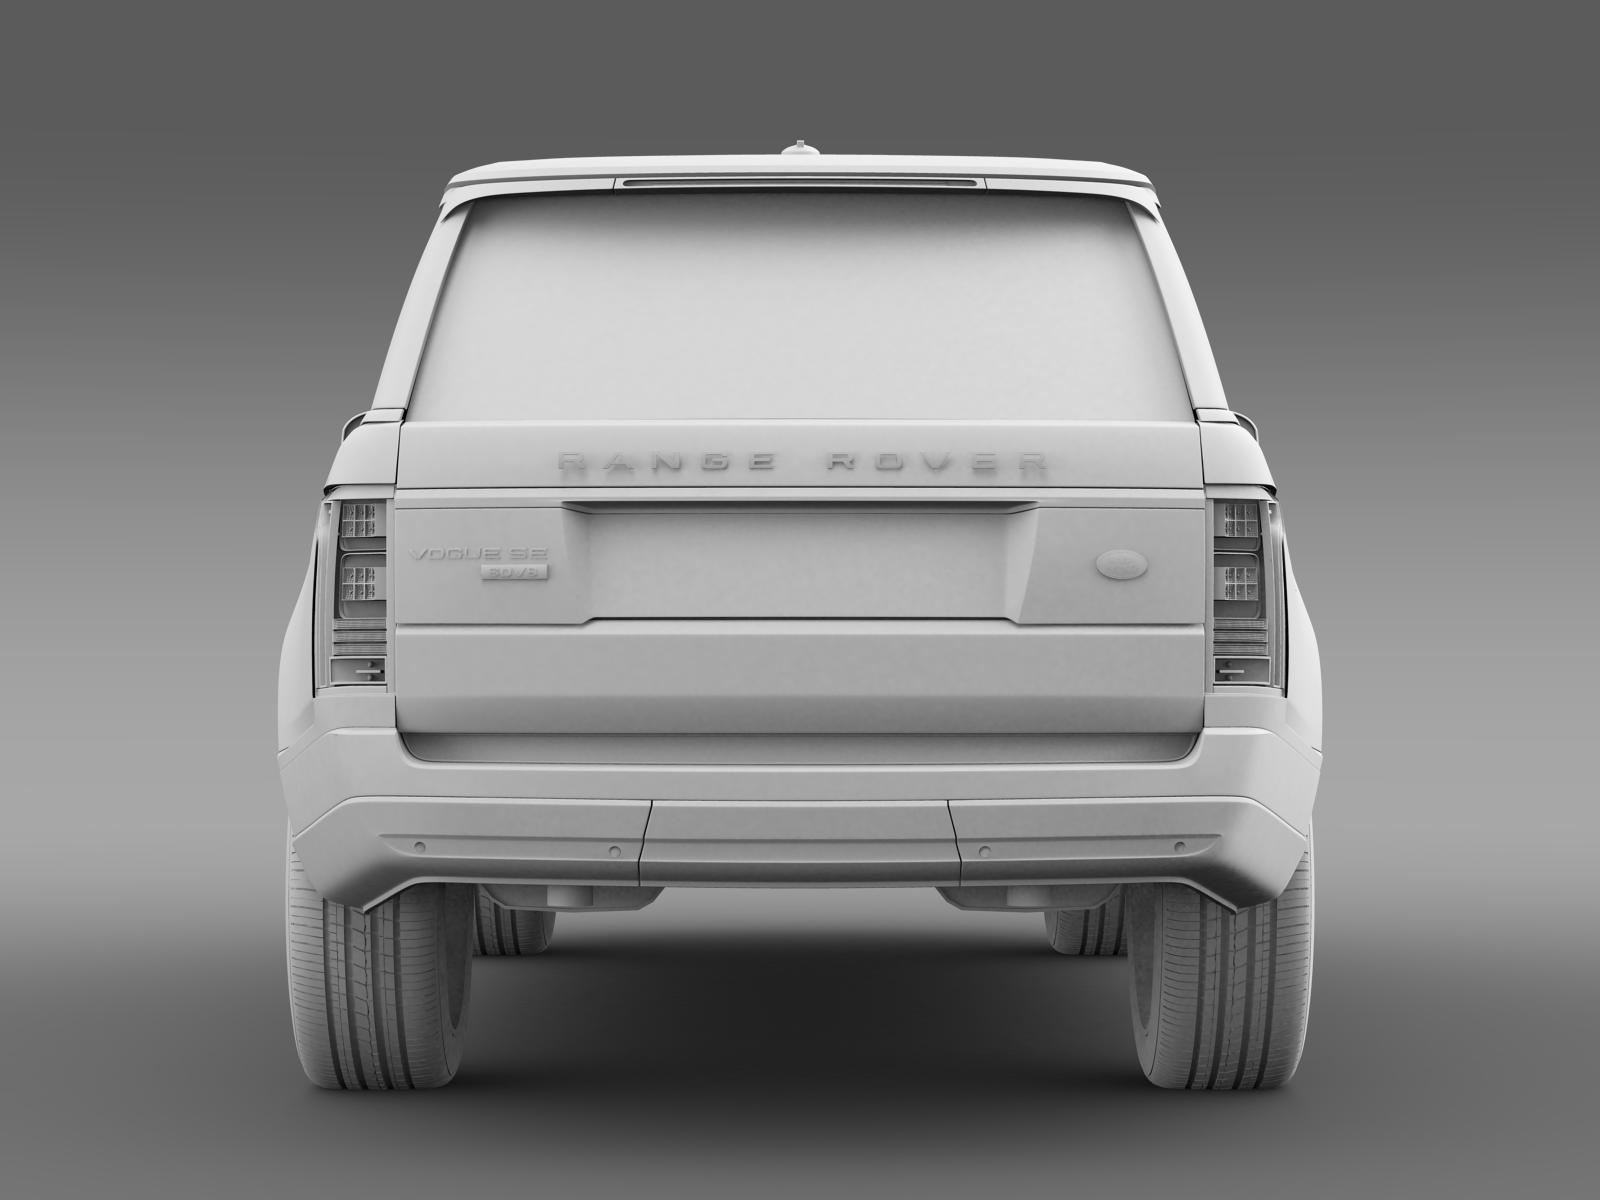 Range Rover Vogue SE SDV8 L405 by creator 3d